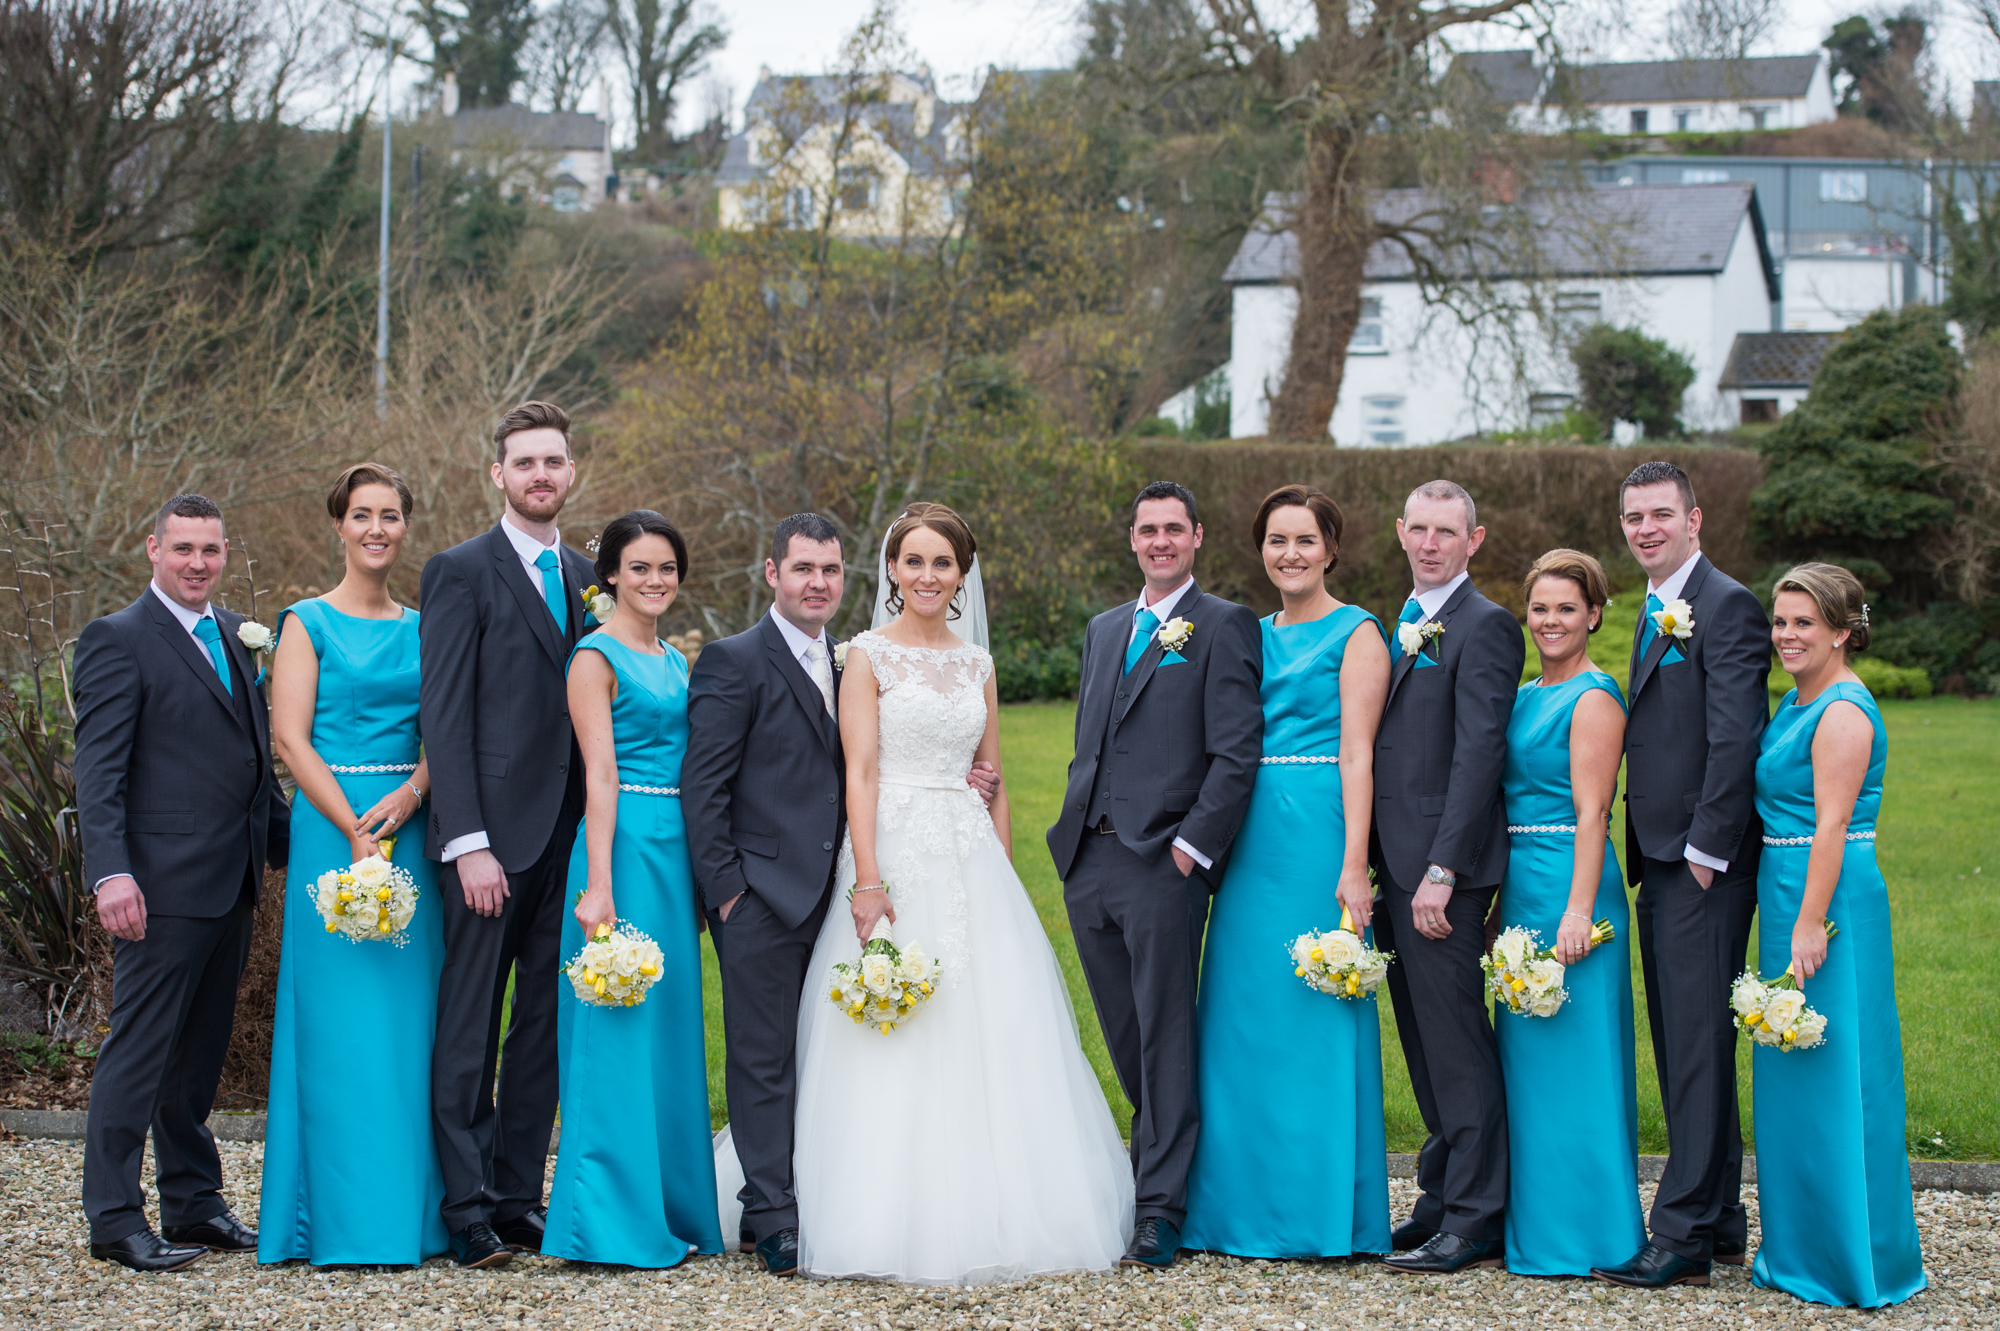 Michael_Gill_Photography_Wedding_Greencastle_Lousie_Jason_Donegal-15.jpg